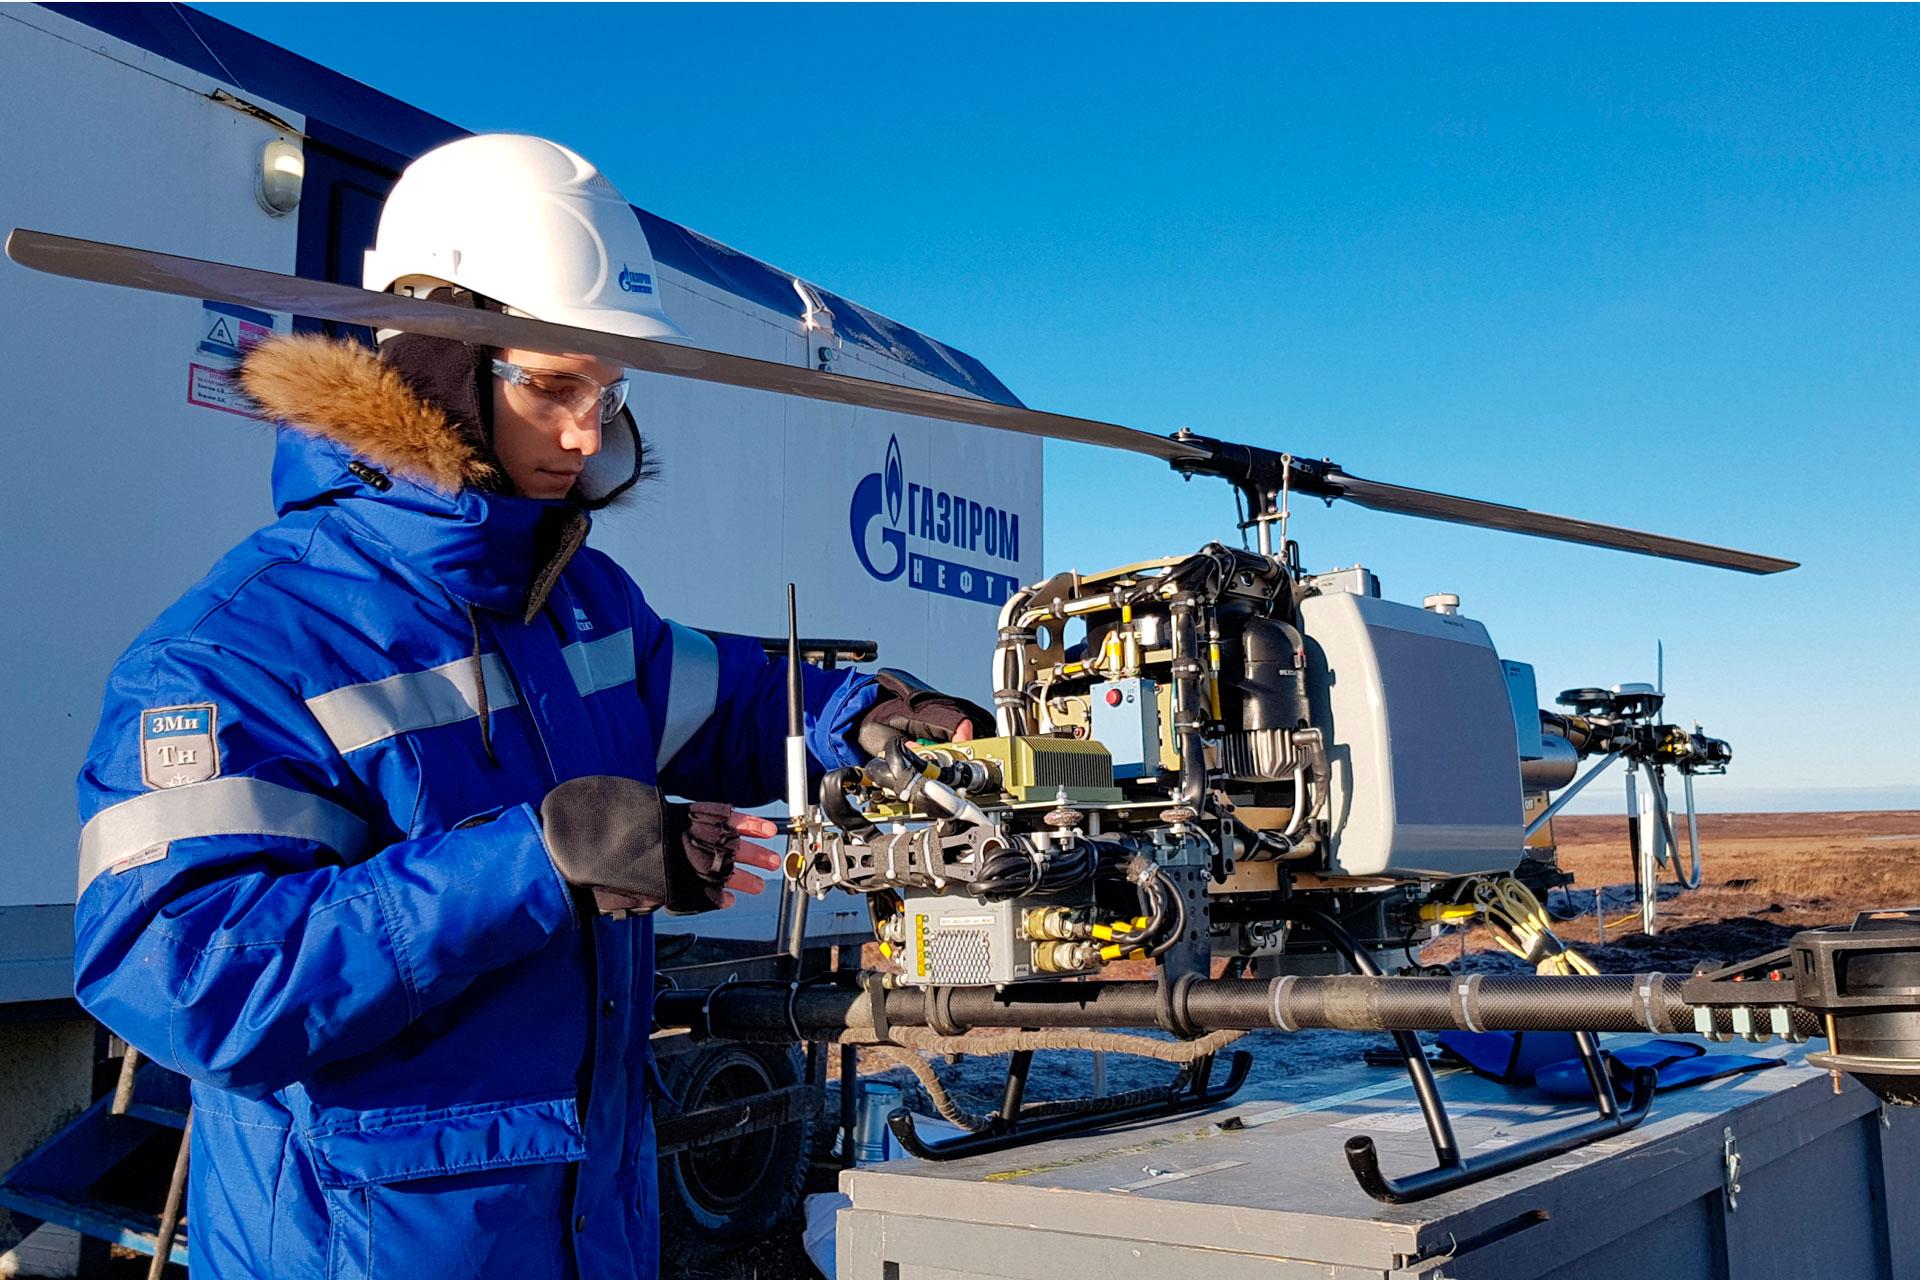 Gazprom Neft trials drones for hydrocarbon exploration